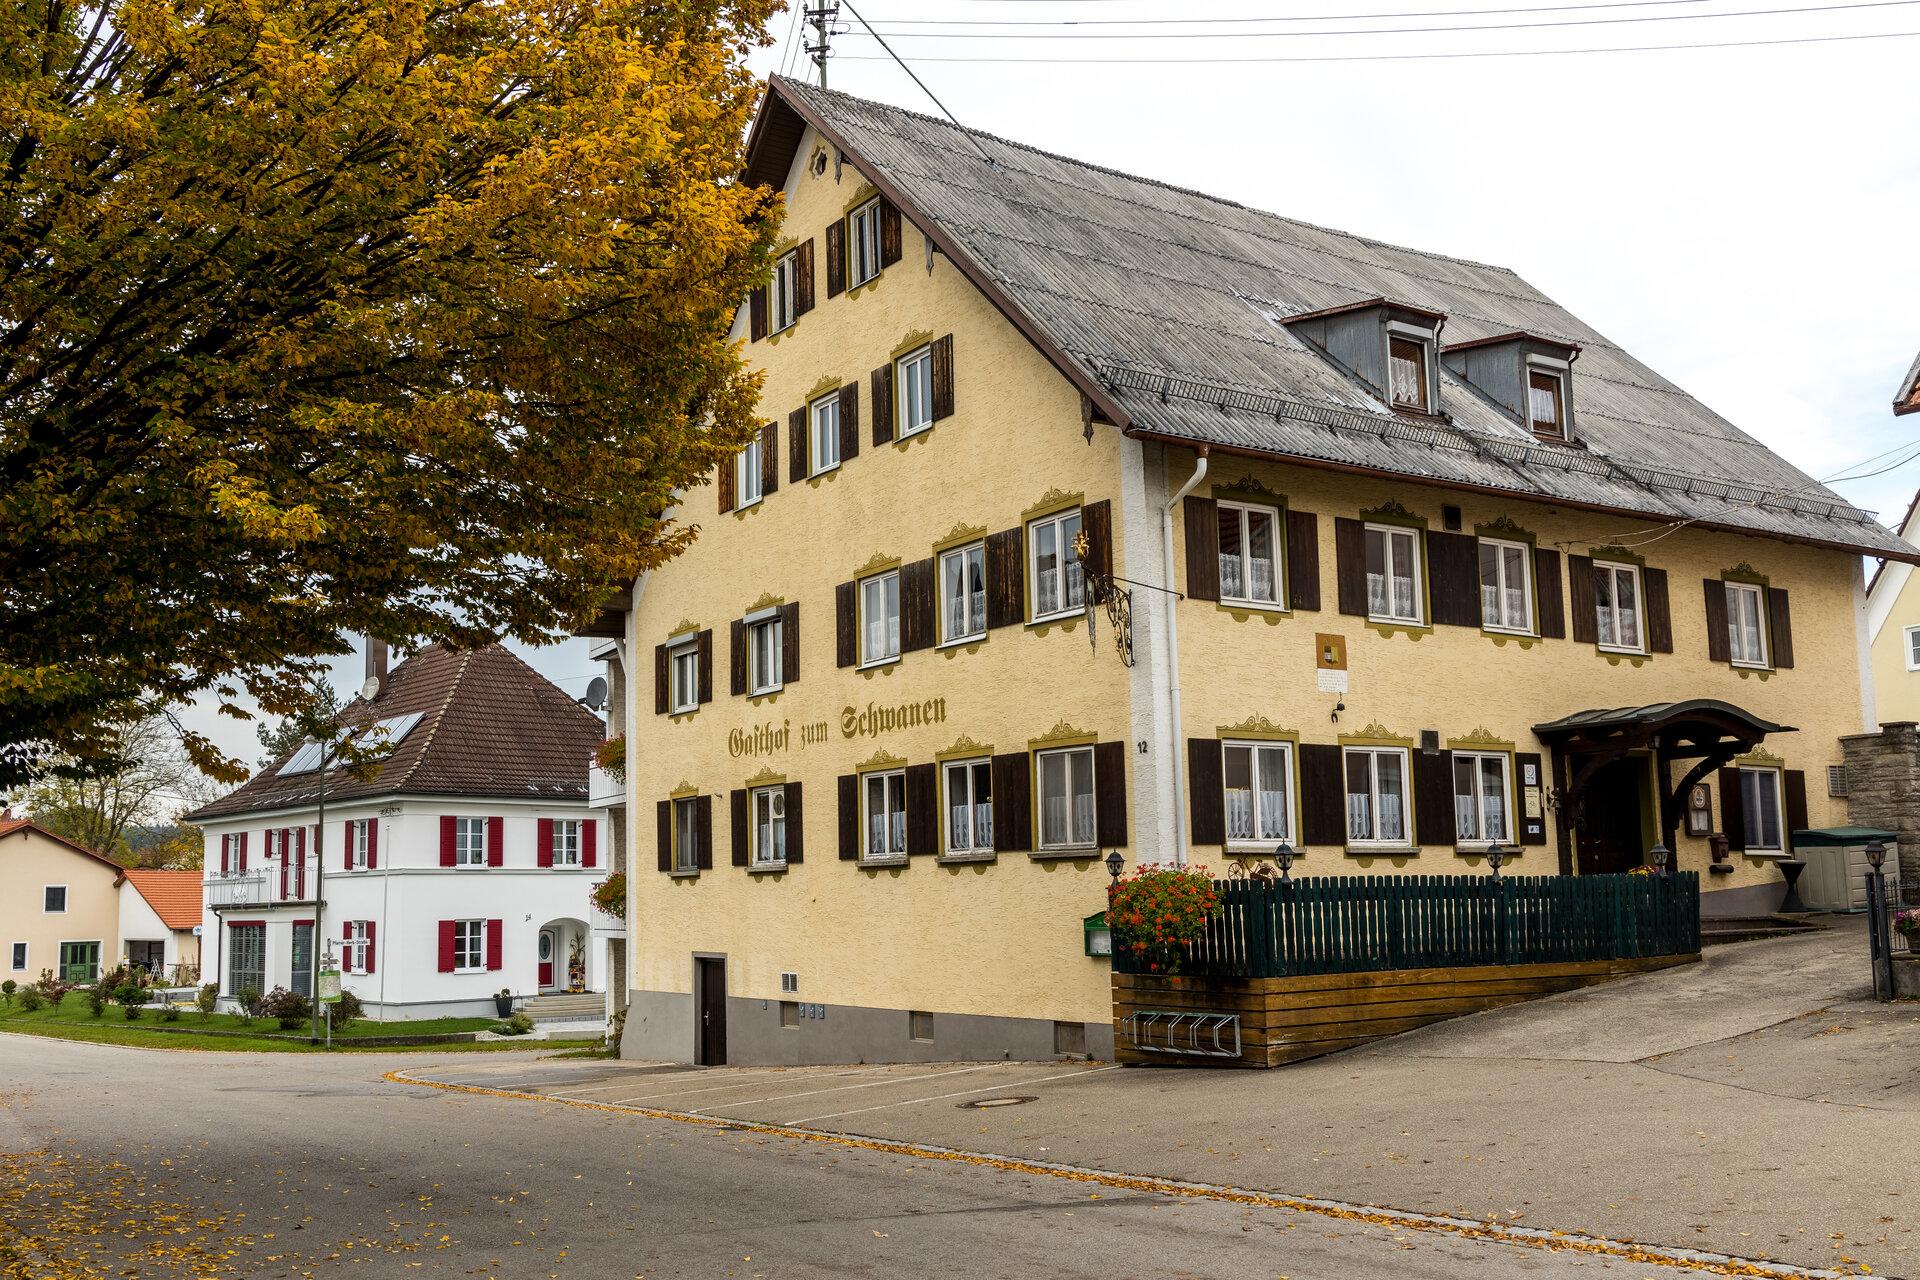 12-Kammlach-Schwanen-189122-19-10-24CK-HDR